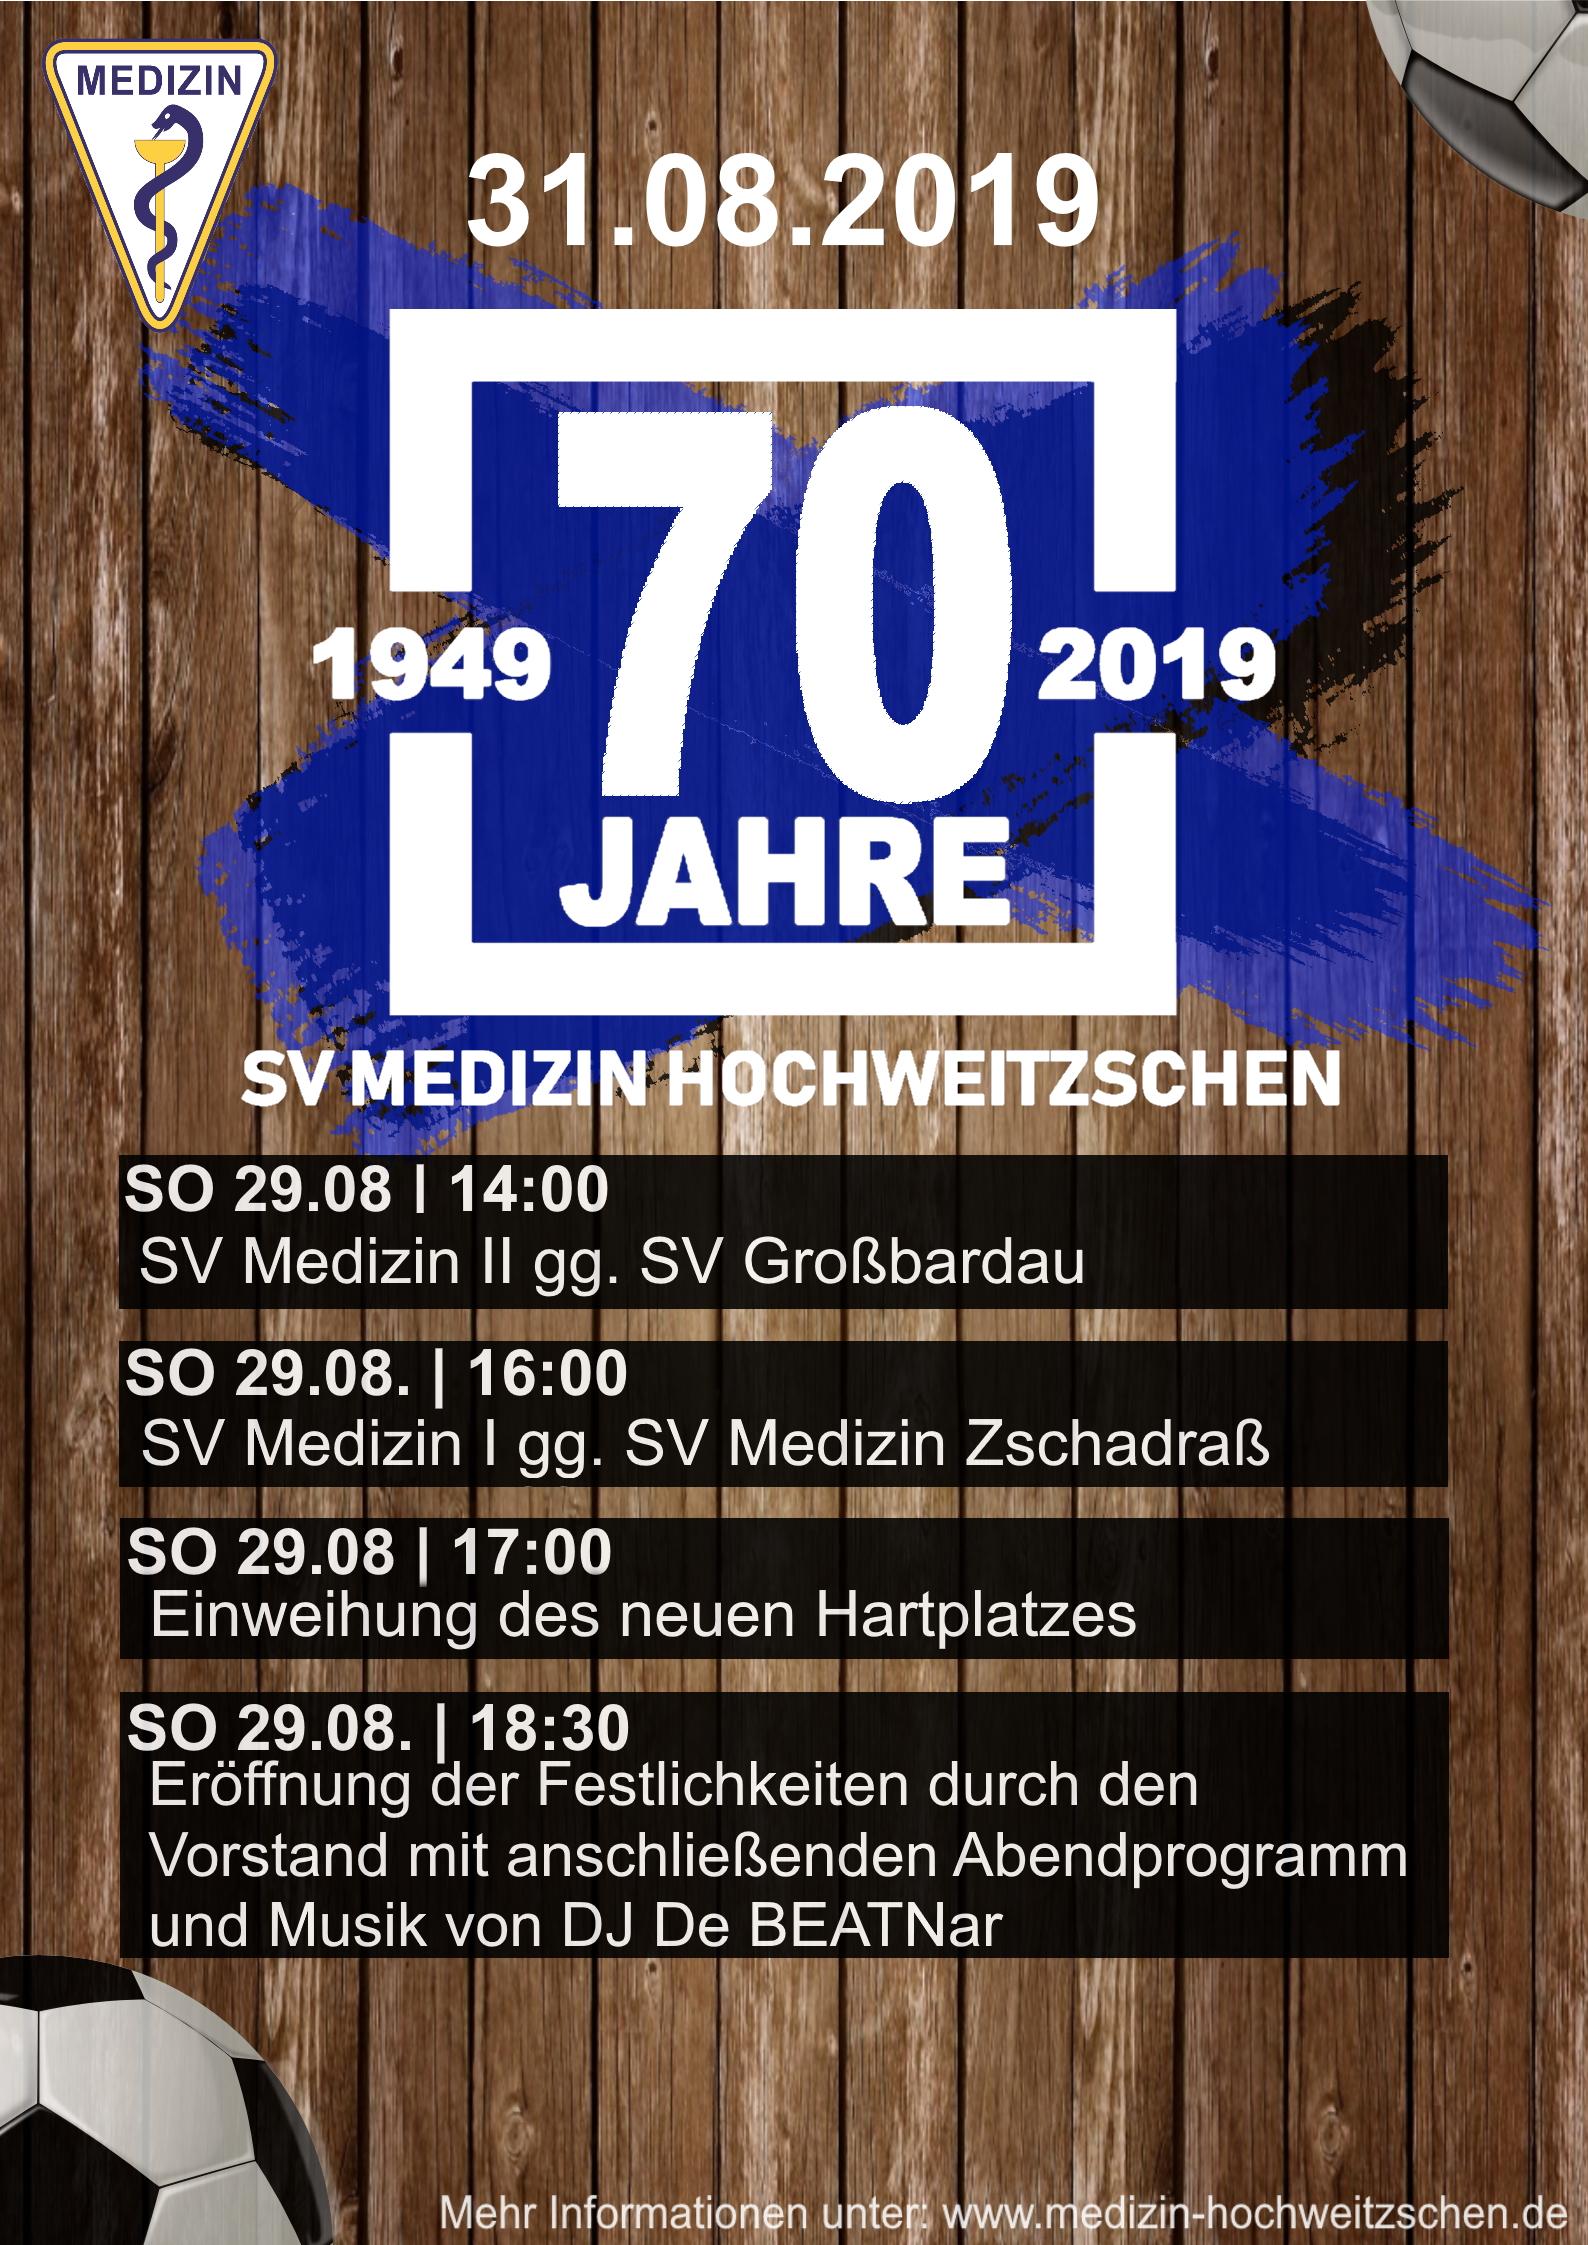 http://www.medizin-hochweitzschen.de/wp-content/uploads/2019/08/Plakat-70-Jahre-31.08.2019.jpg